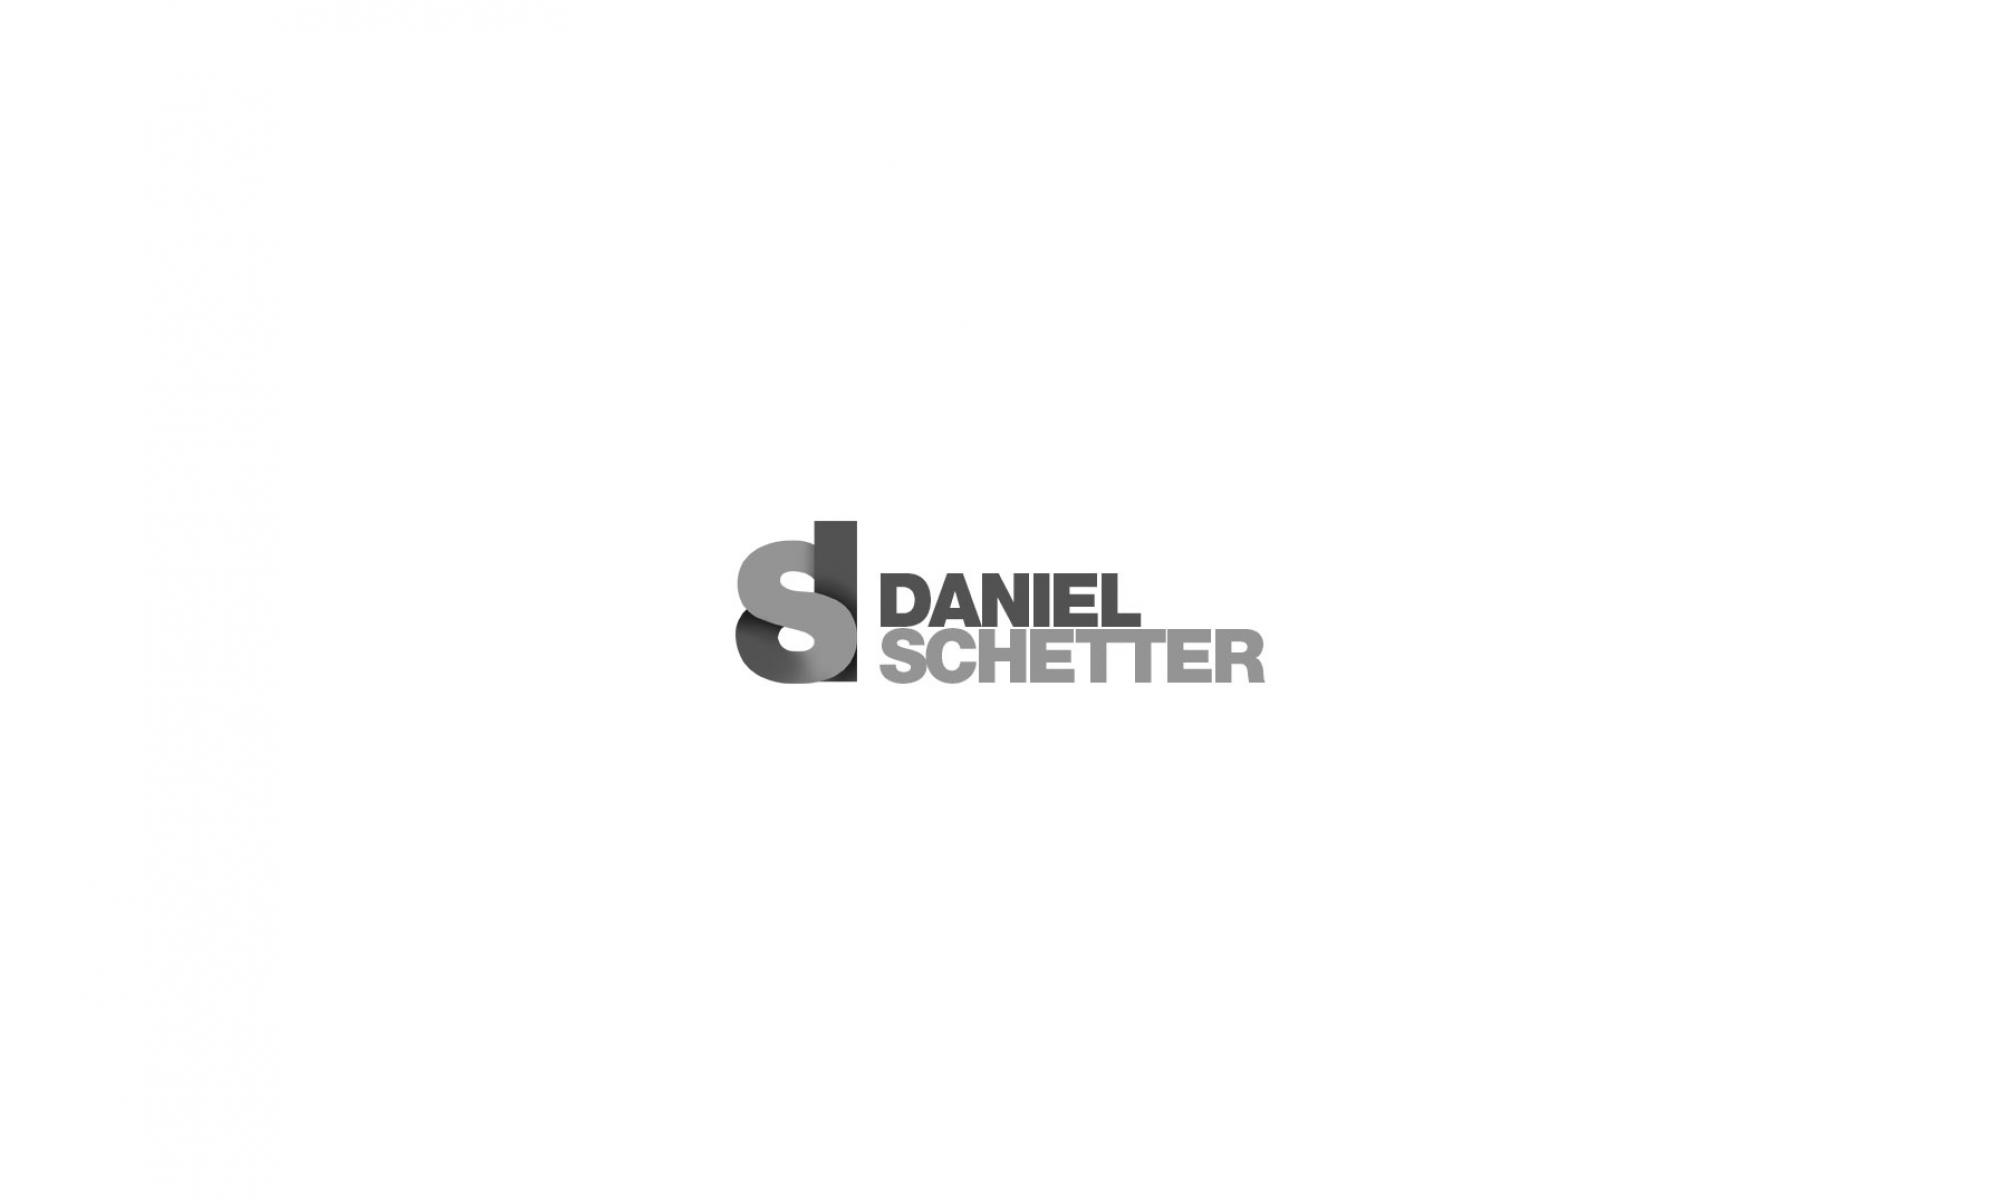 Daniel Schetter